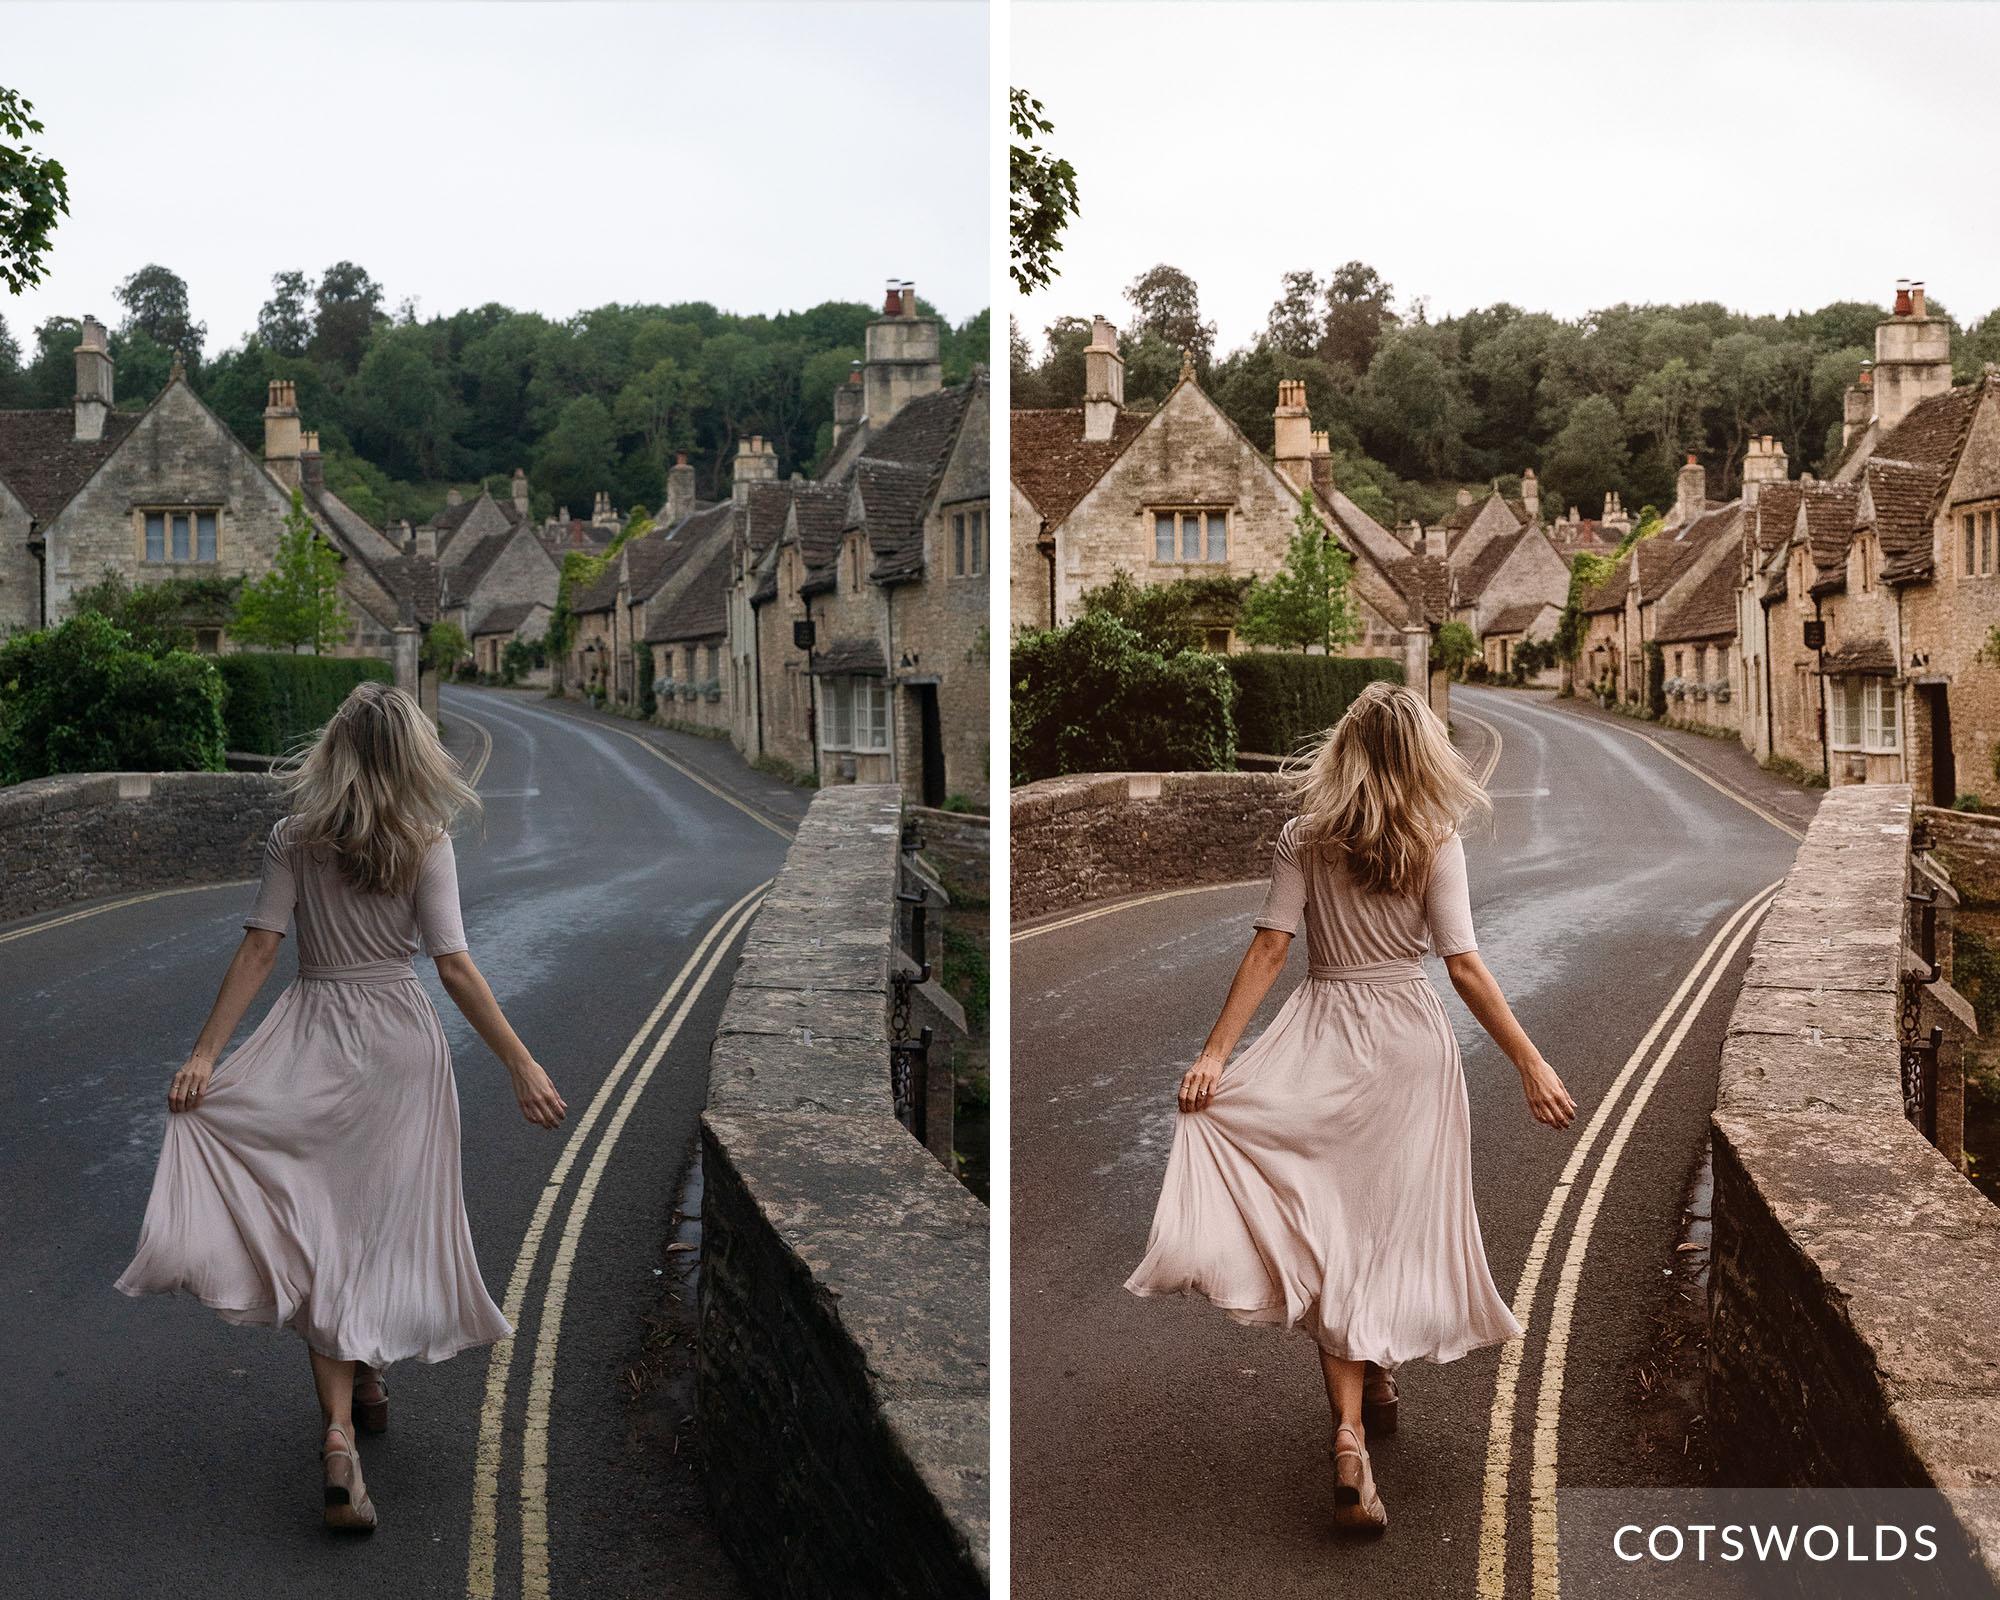 COTSWOLDS - Find Us Lost Europe Lightroom Mobile Preset Collection